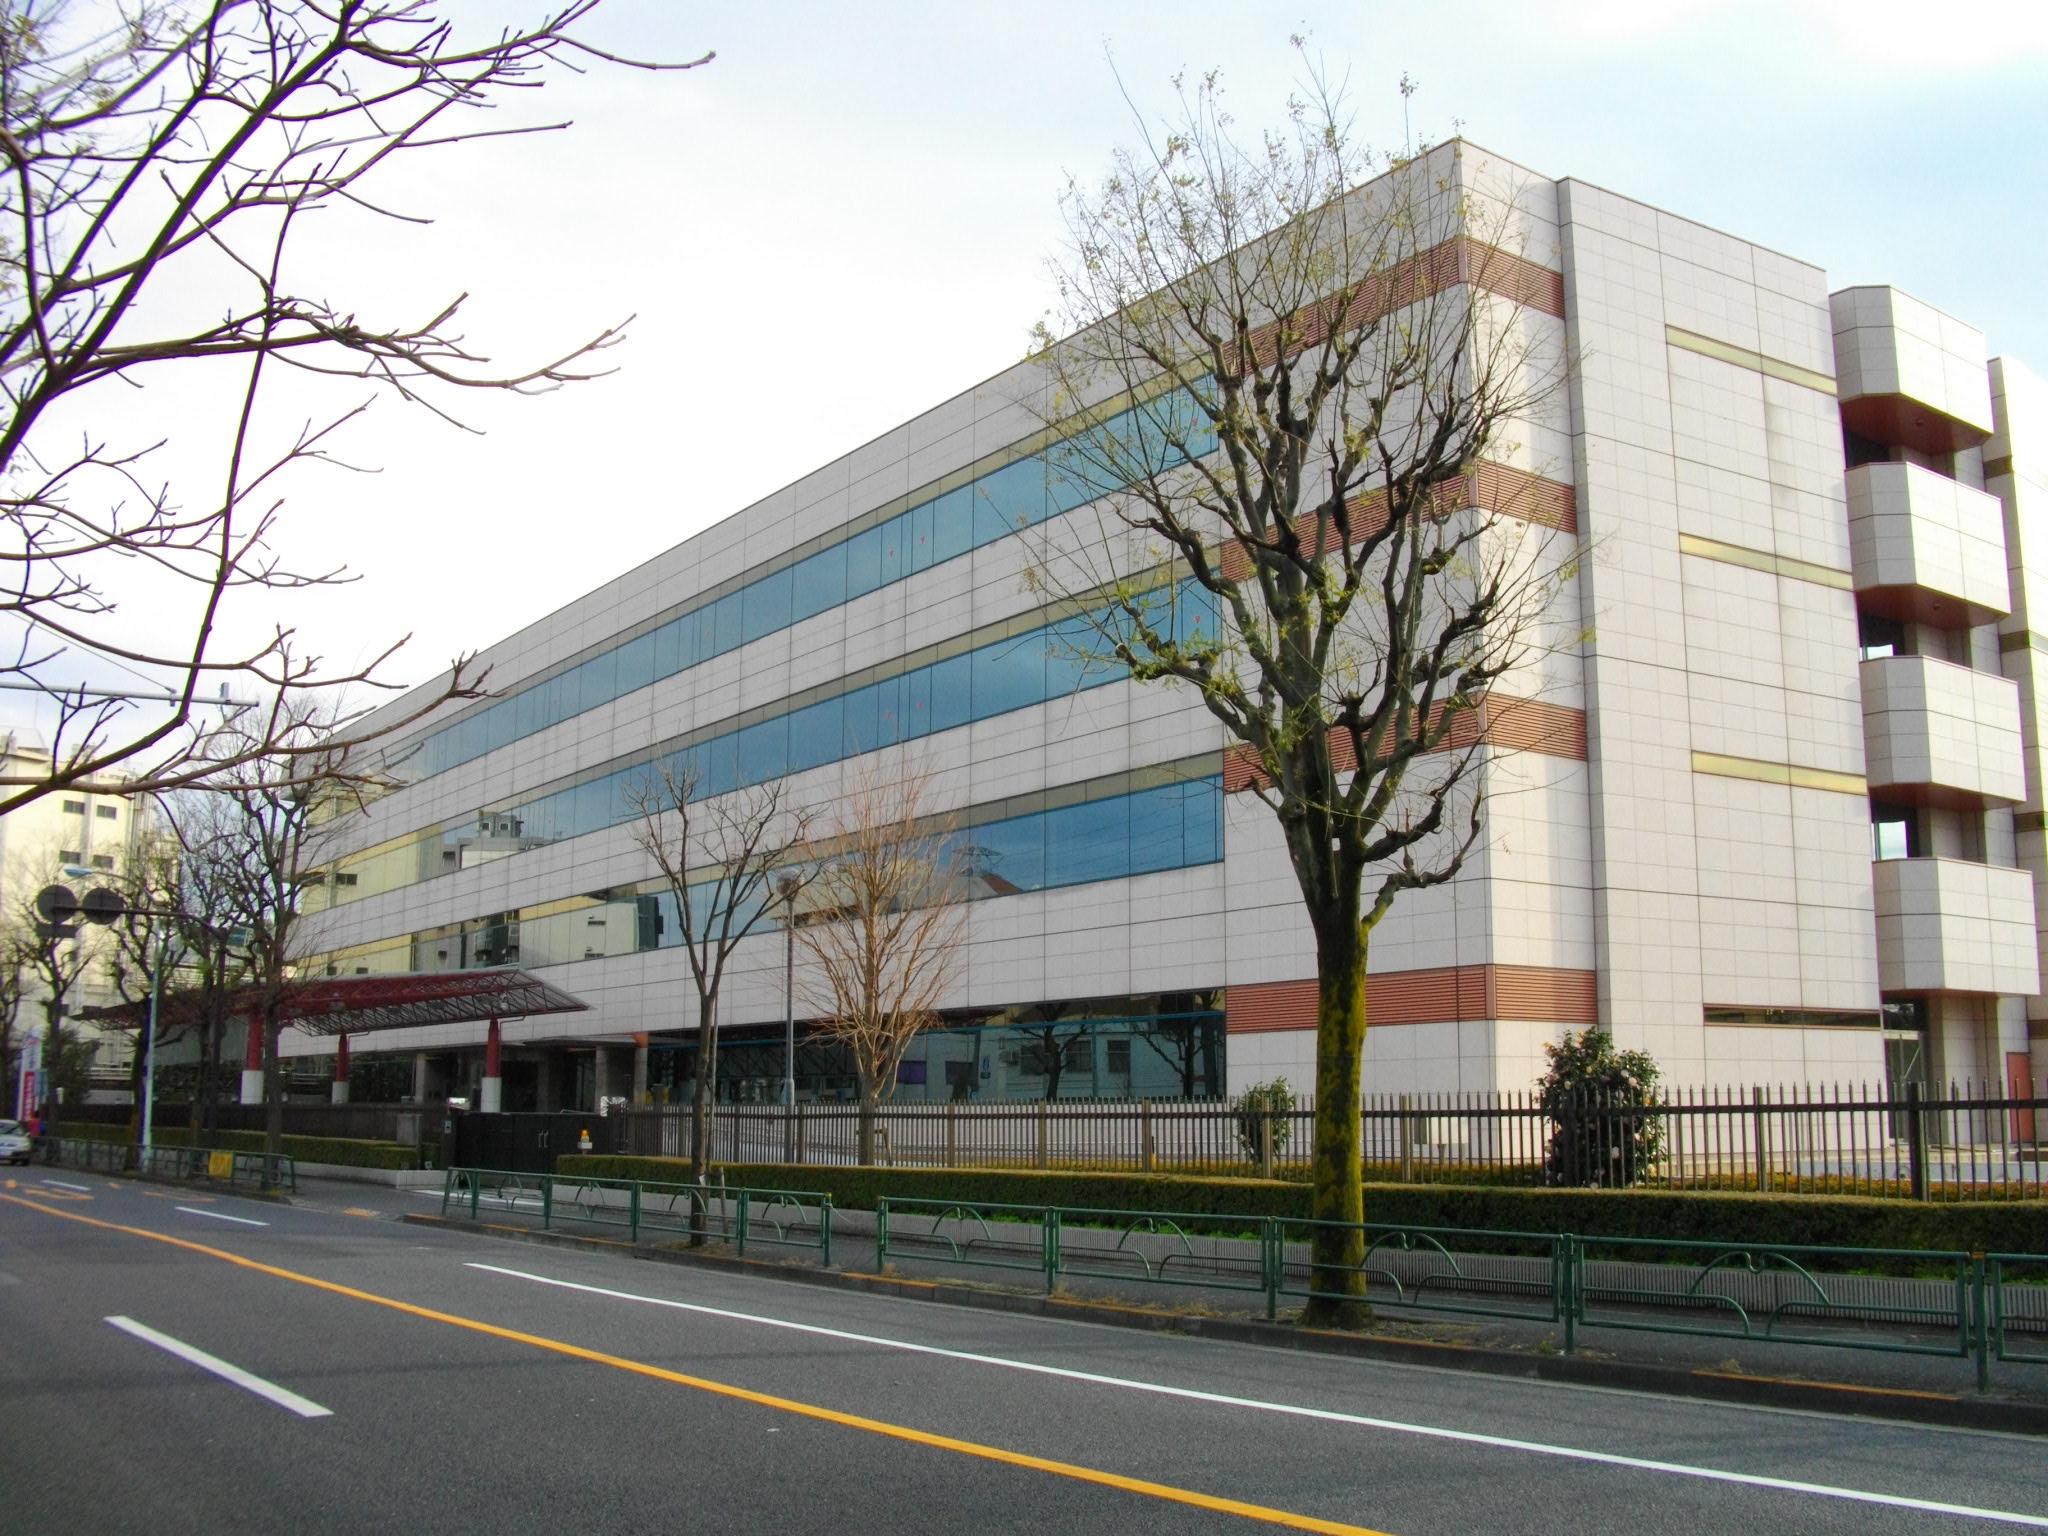 日本 年金 機構 神奈川 事務 センター